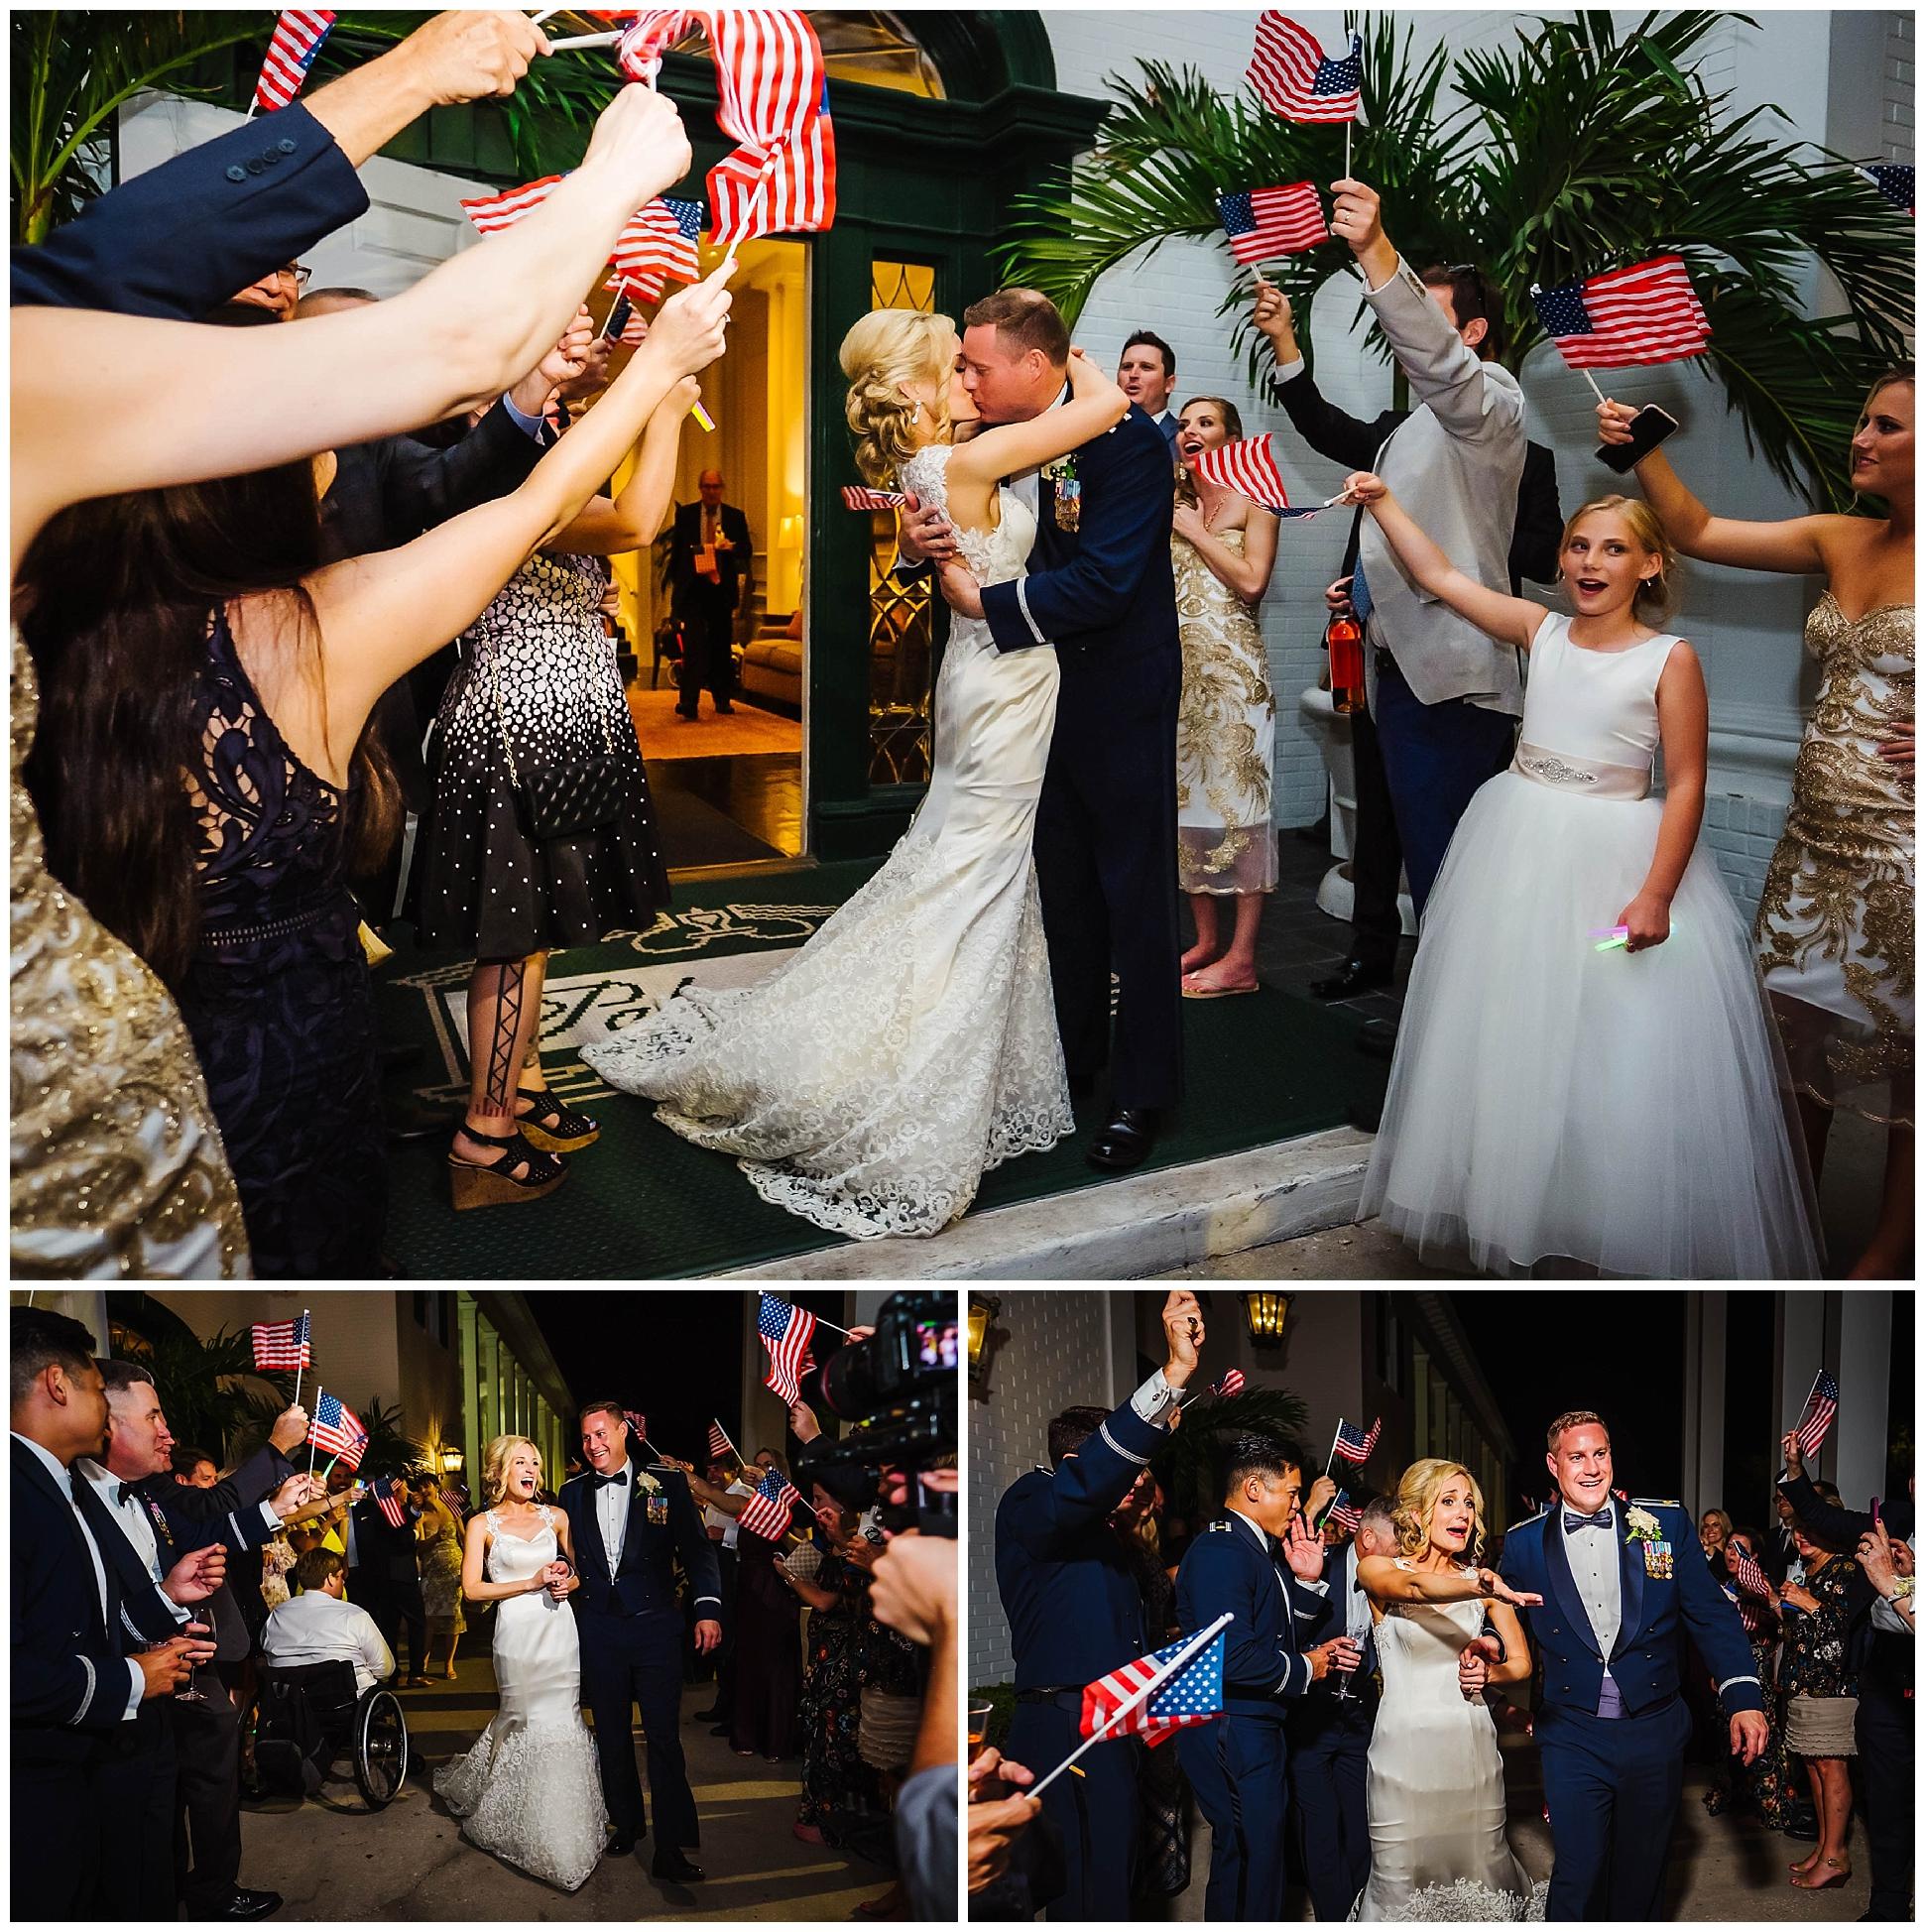 tampa-wedding-photographer-sleeves-palma-ceia-country-club-golf-course-sunset-luxury_0115.jpg